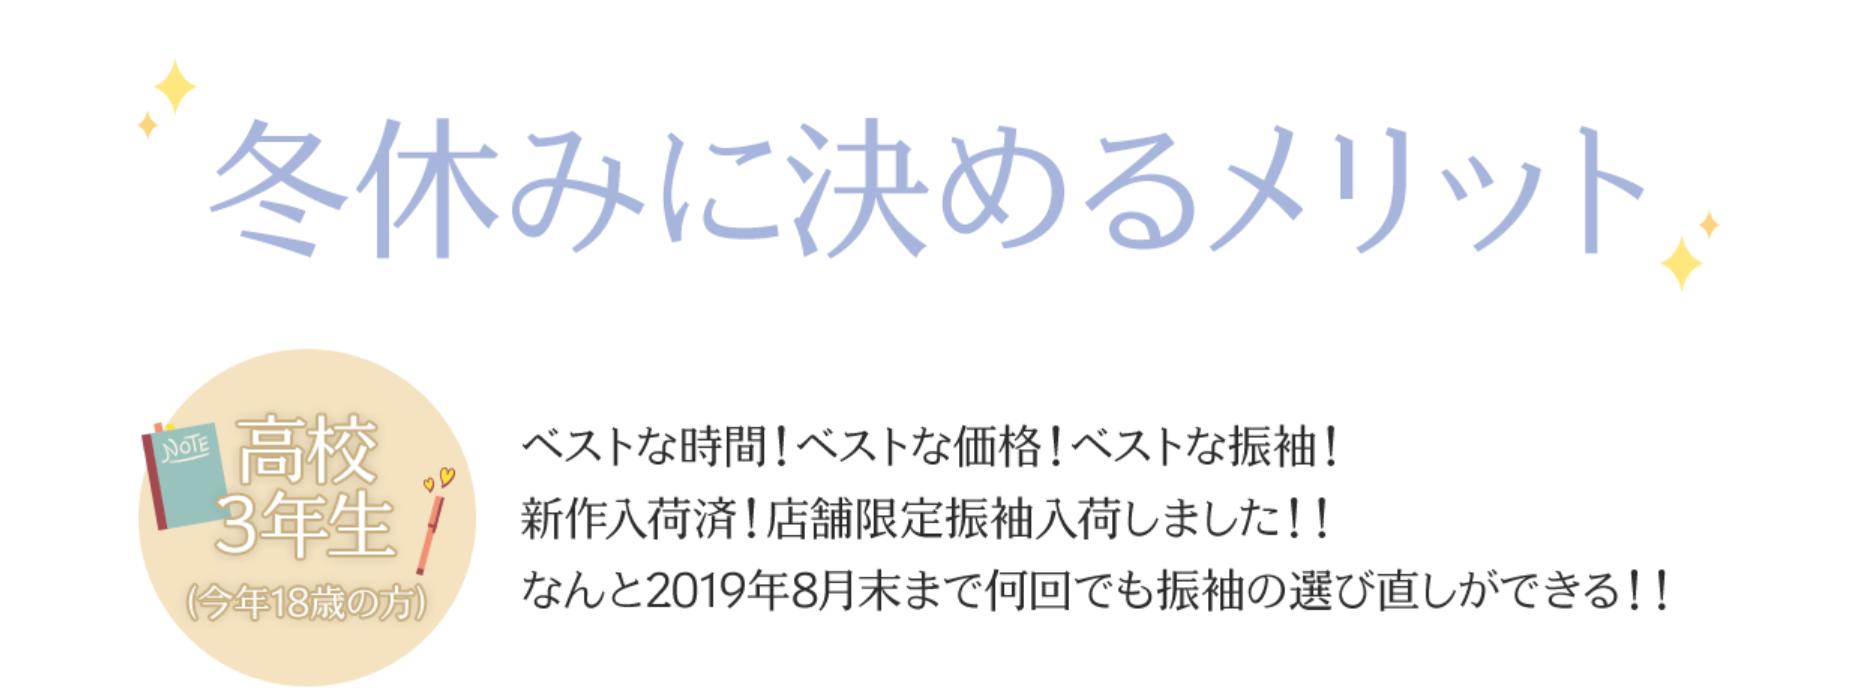 2019-01-08 (1)